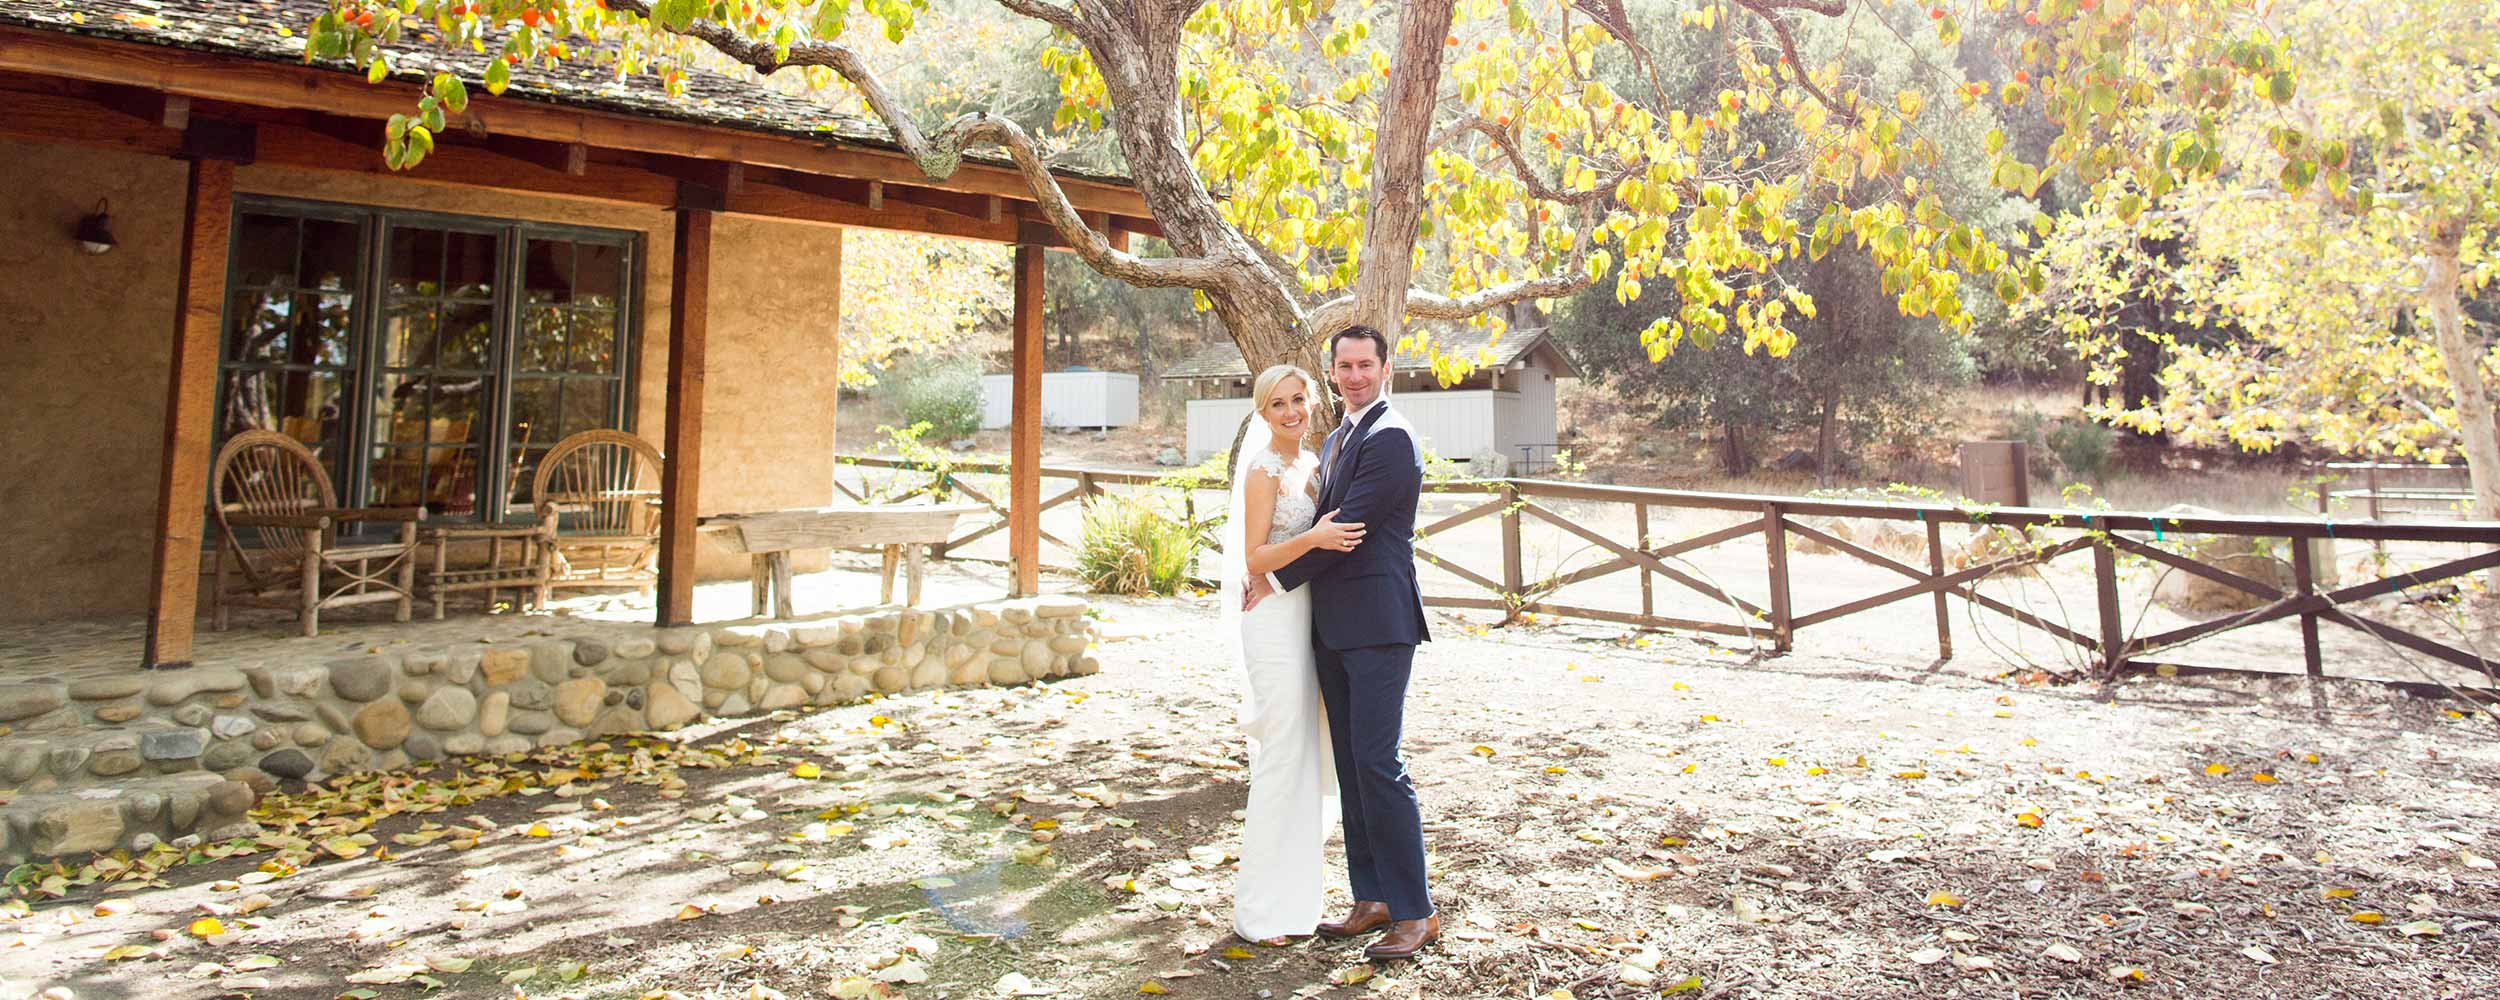 Alisal wedding - Alisal Resort in Solvang California